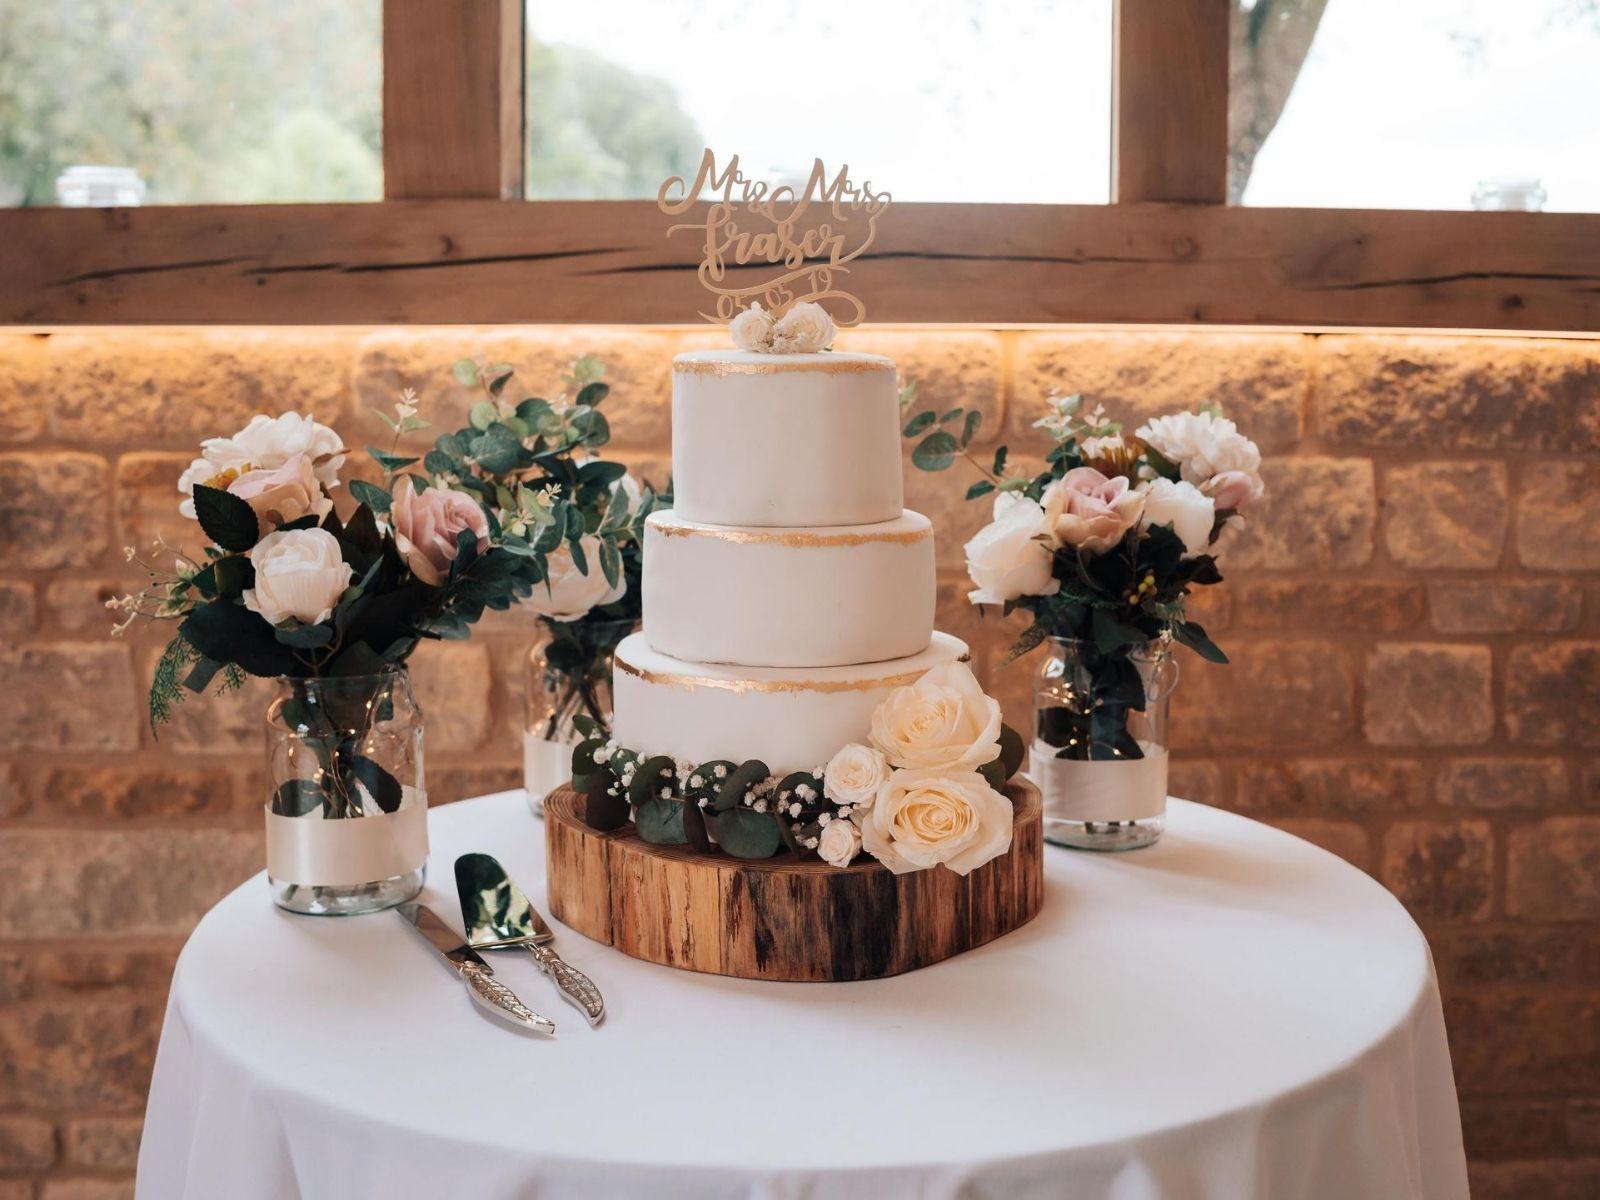 DIY wedding cake baked by bride